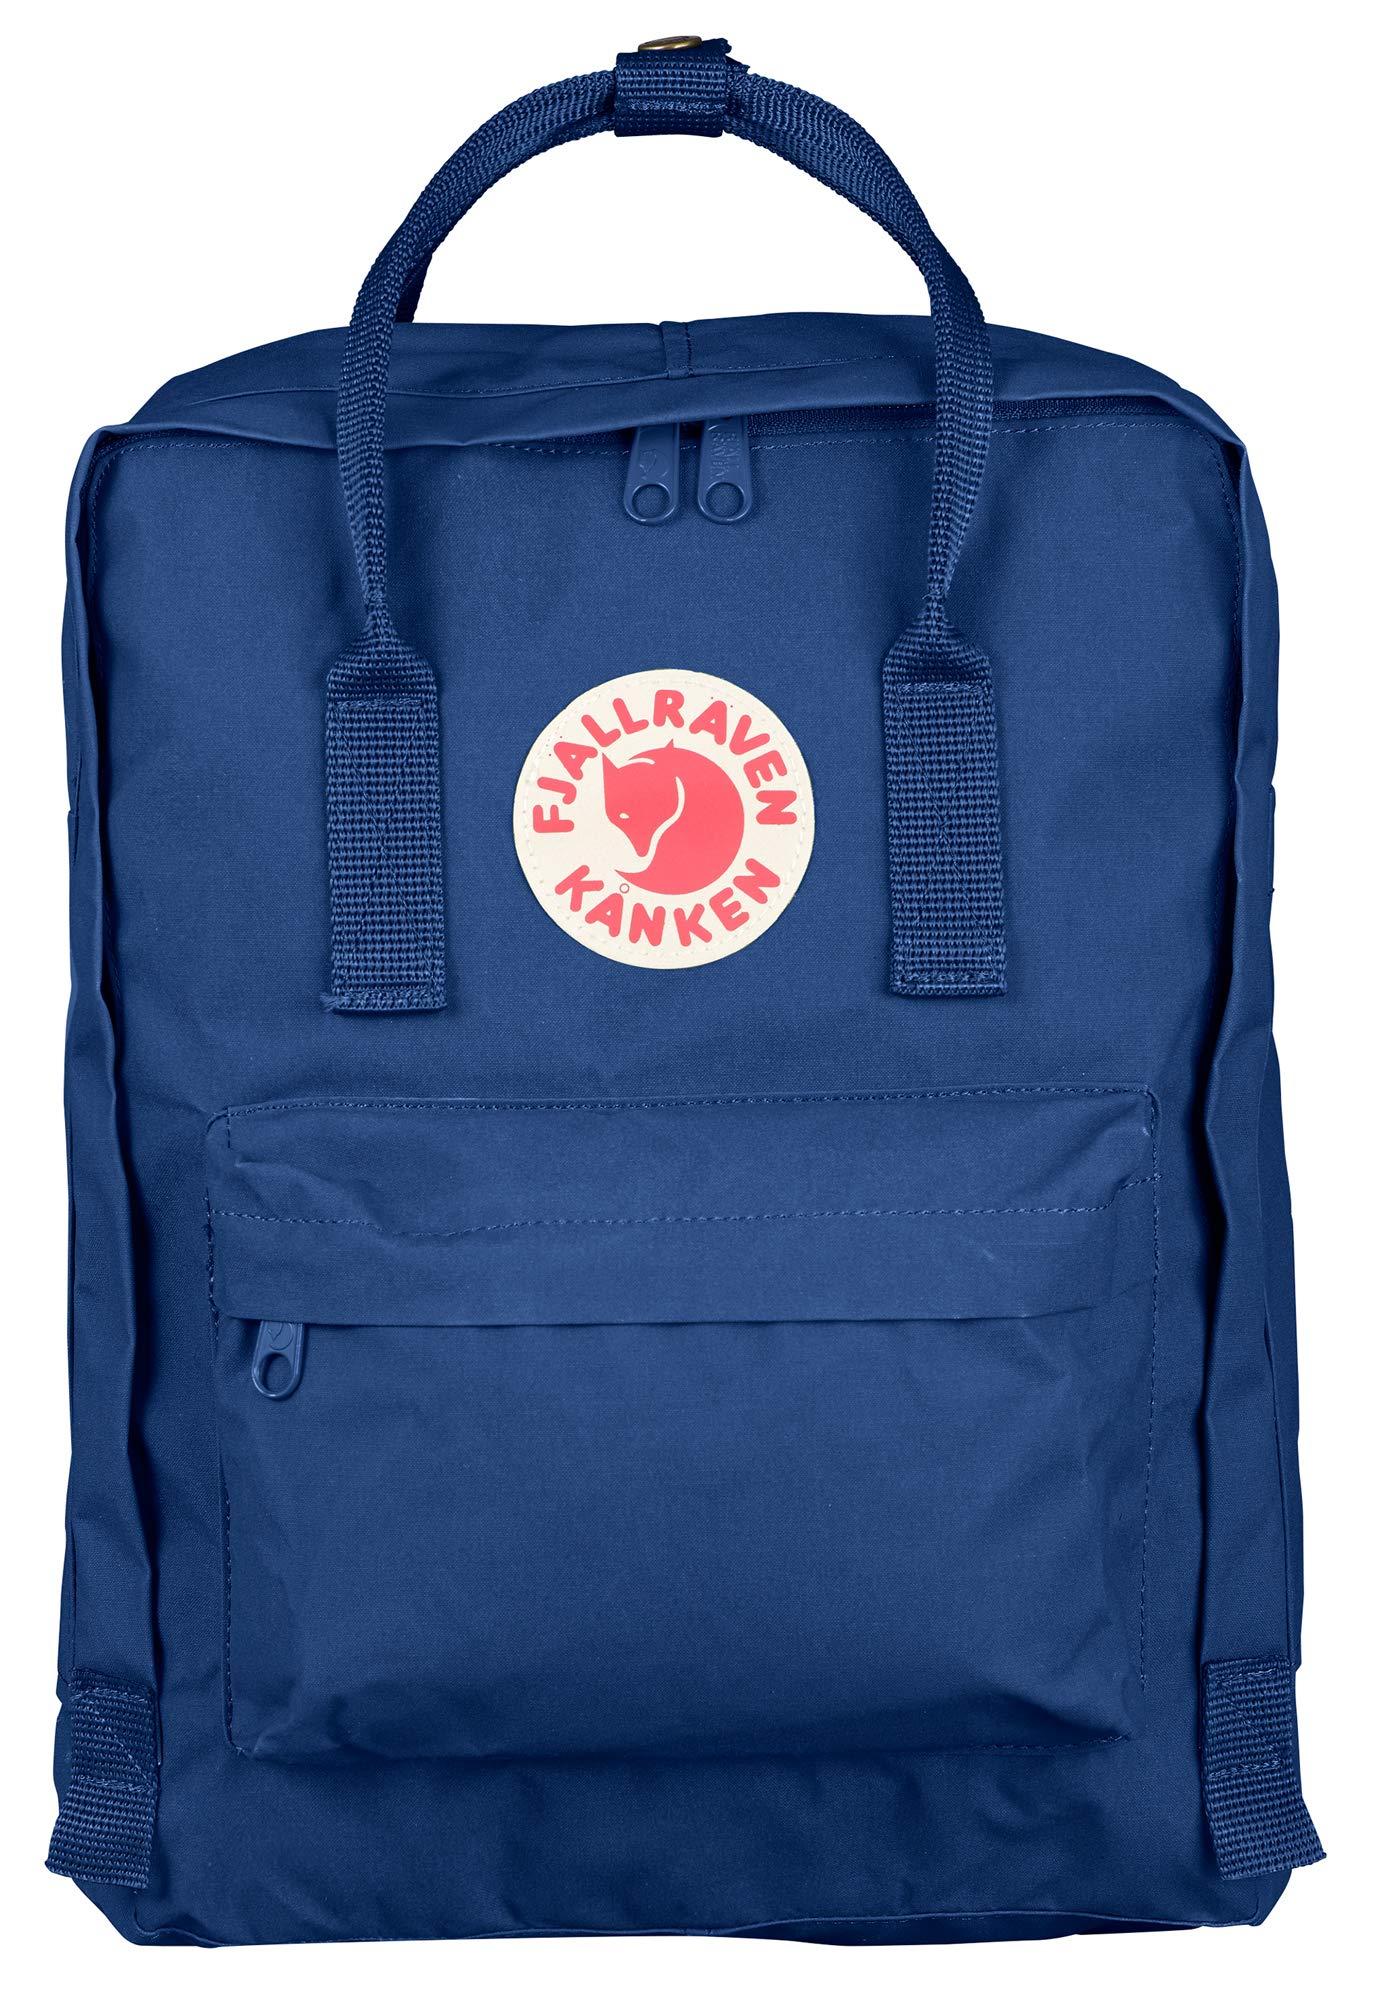 Fjallraven - Kanken Classic Backpack for Everyday, Deep Blue